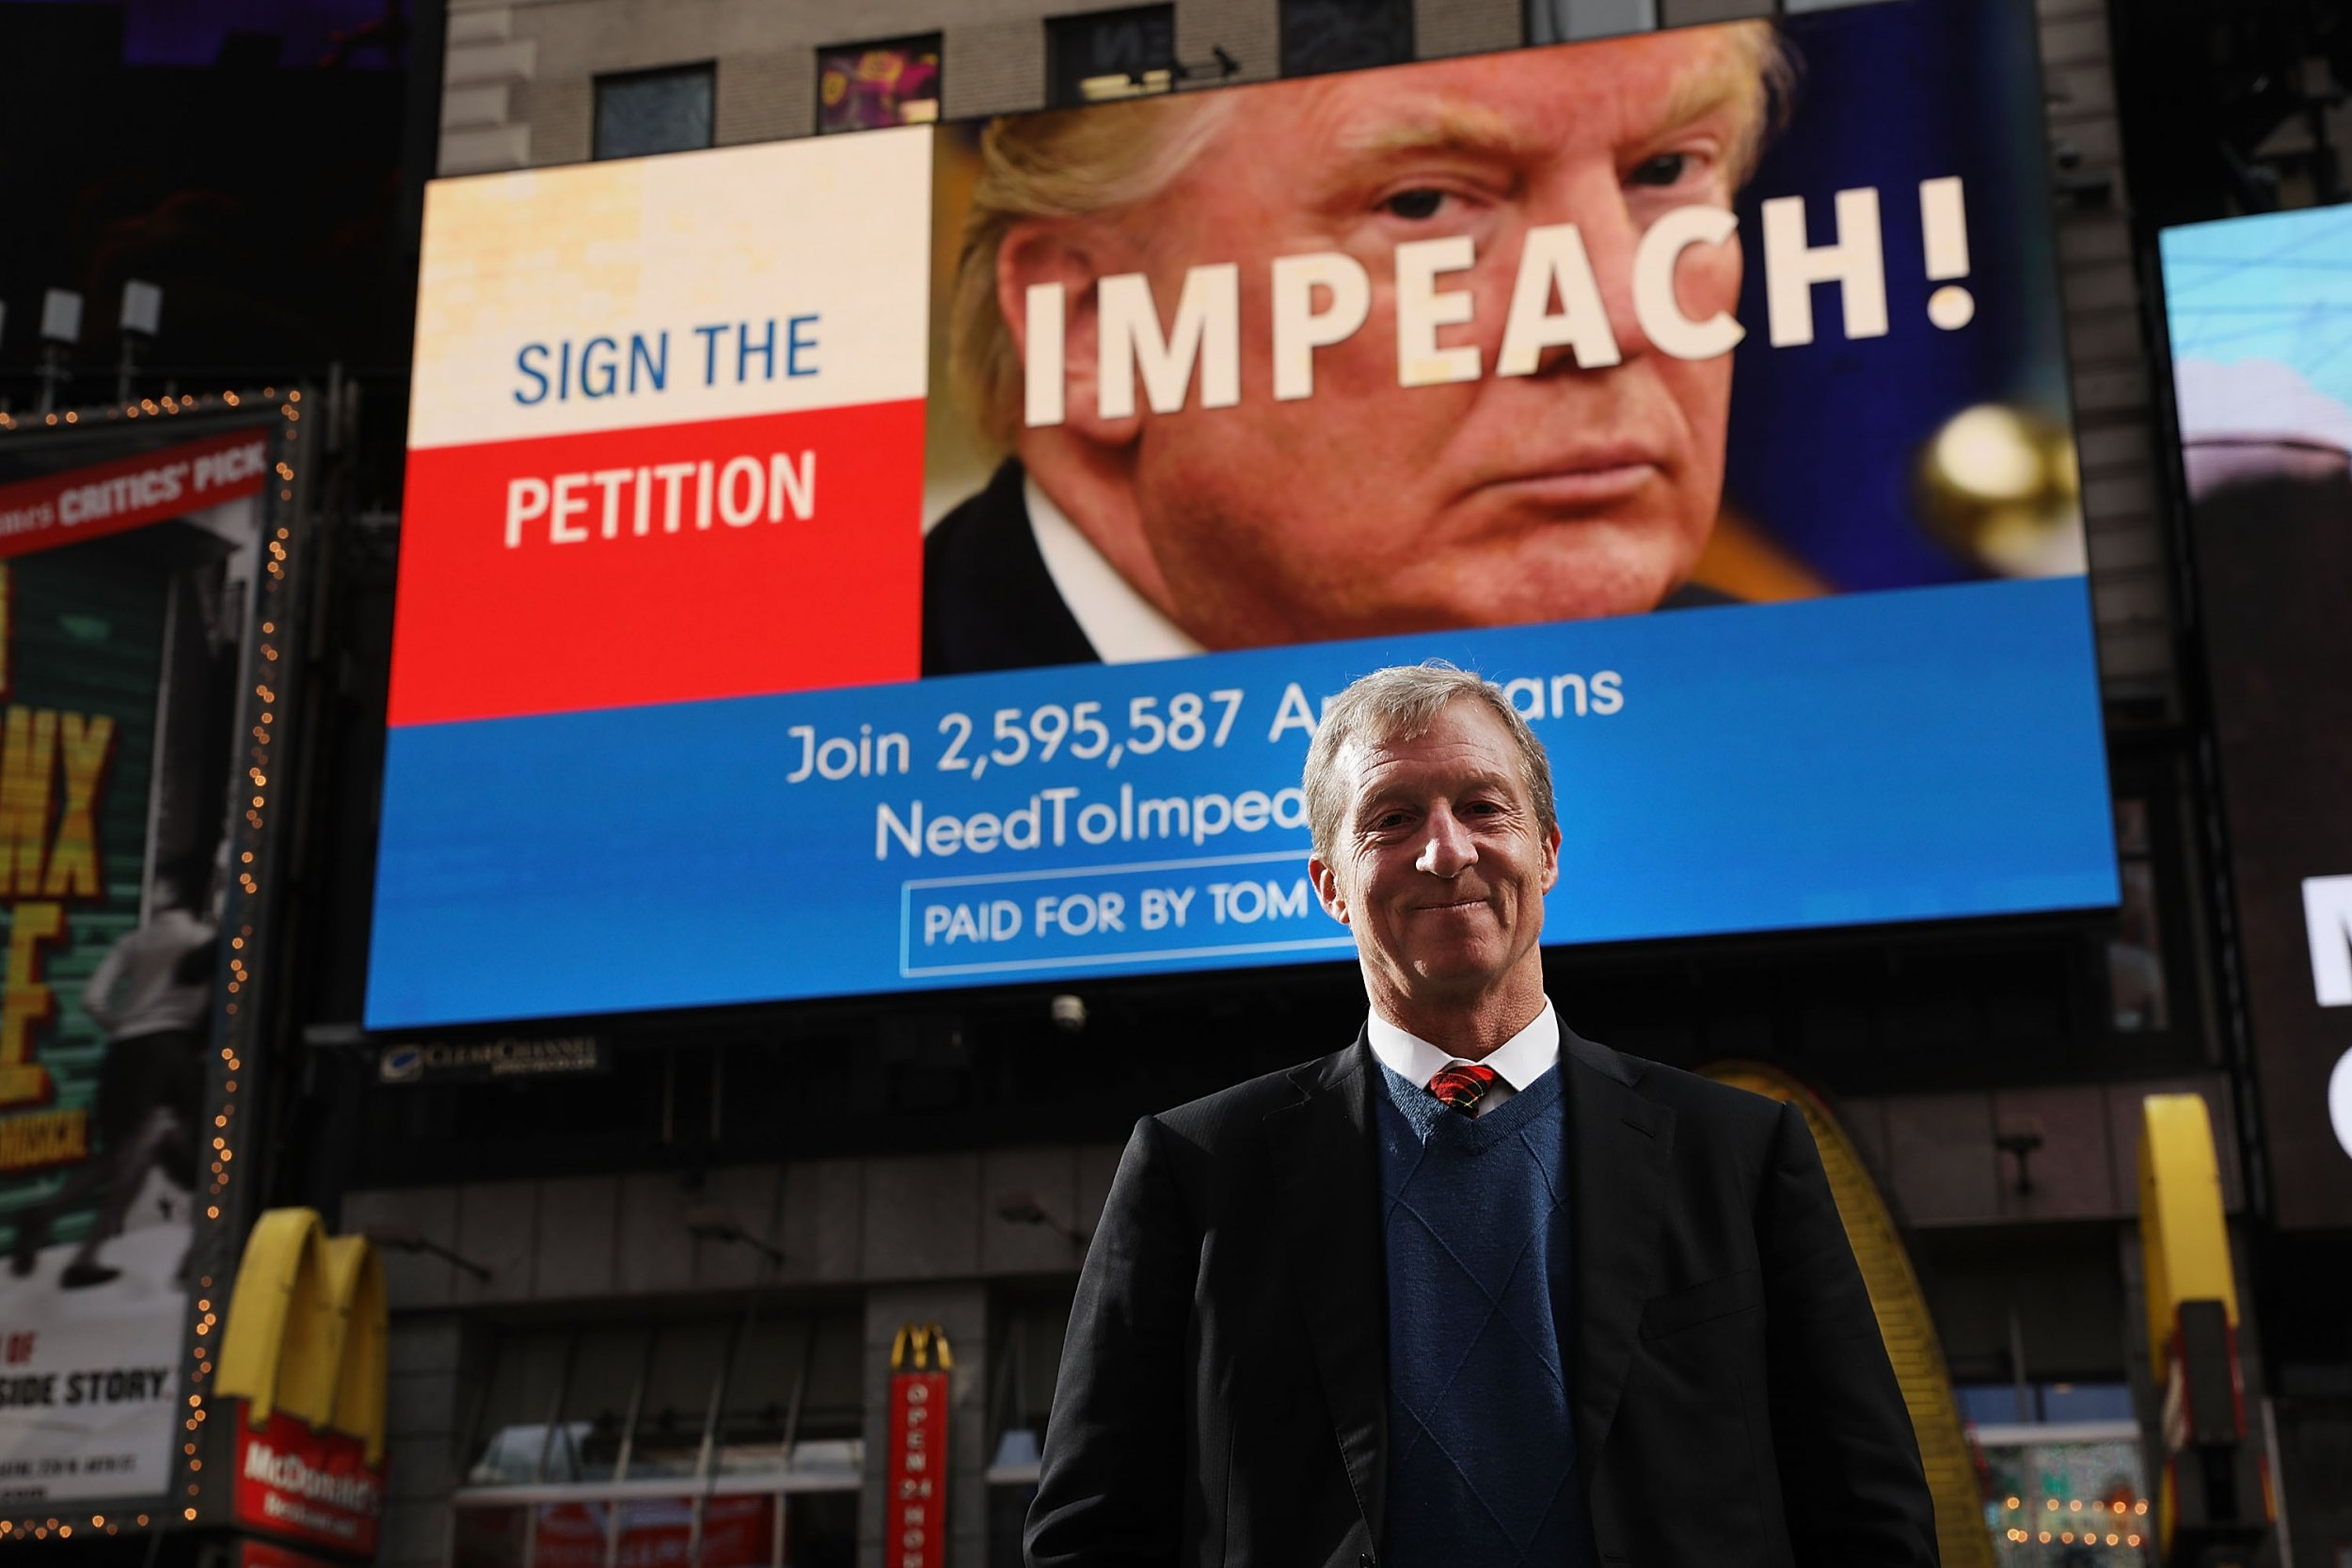 04_03_18_ImpeachGuide